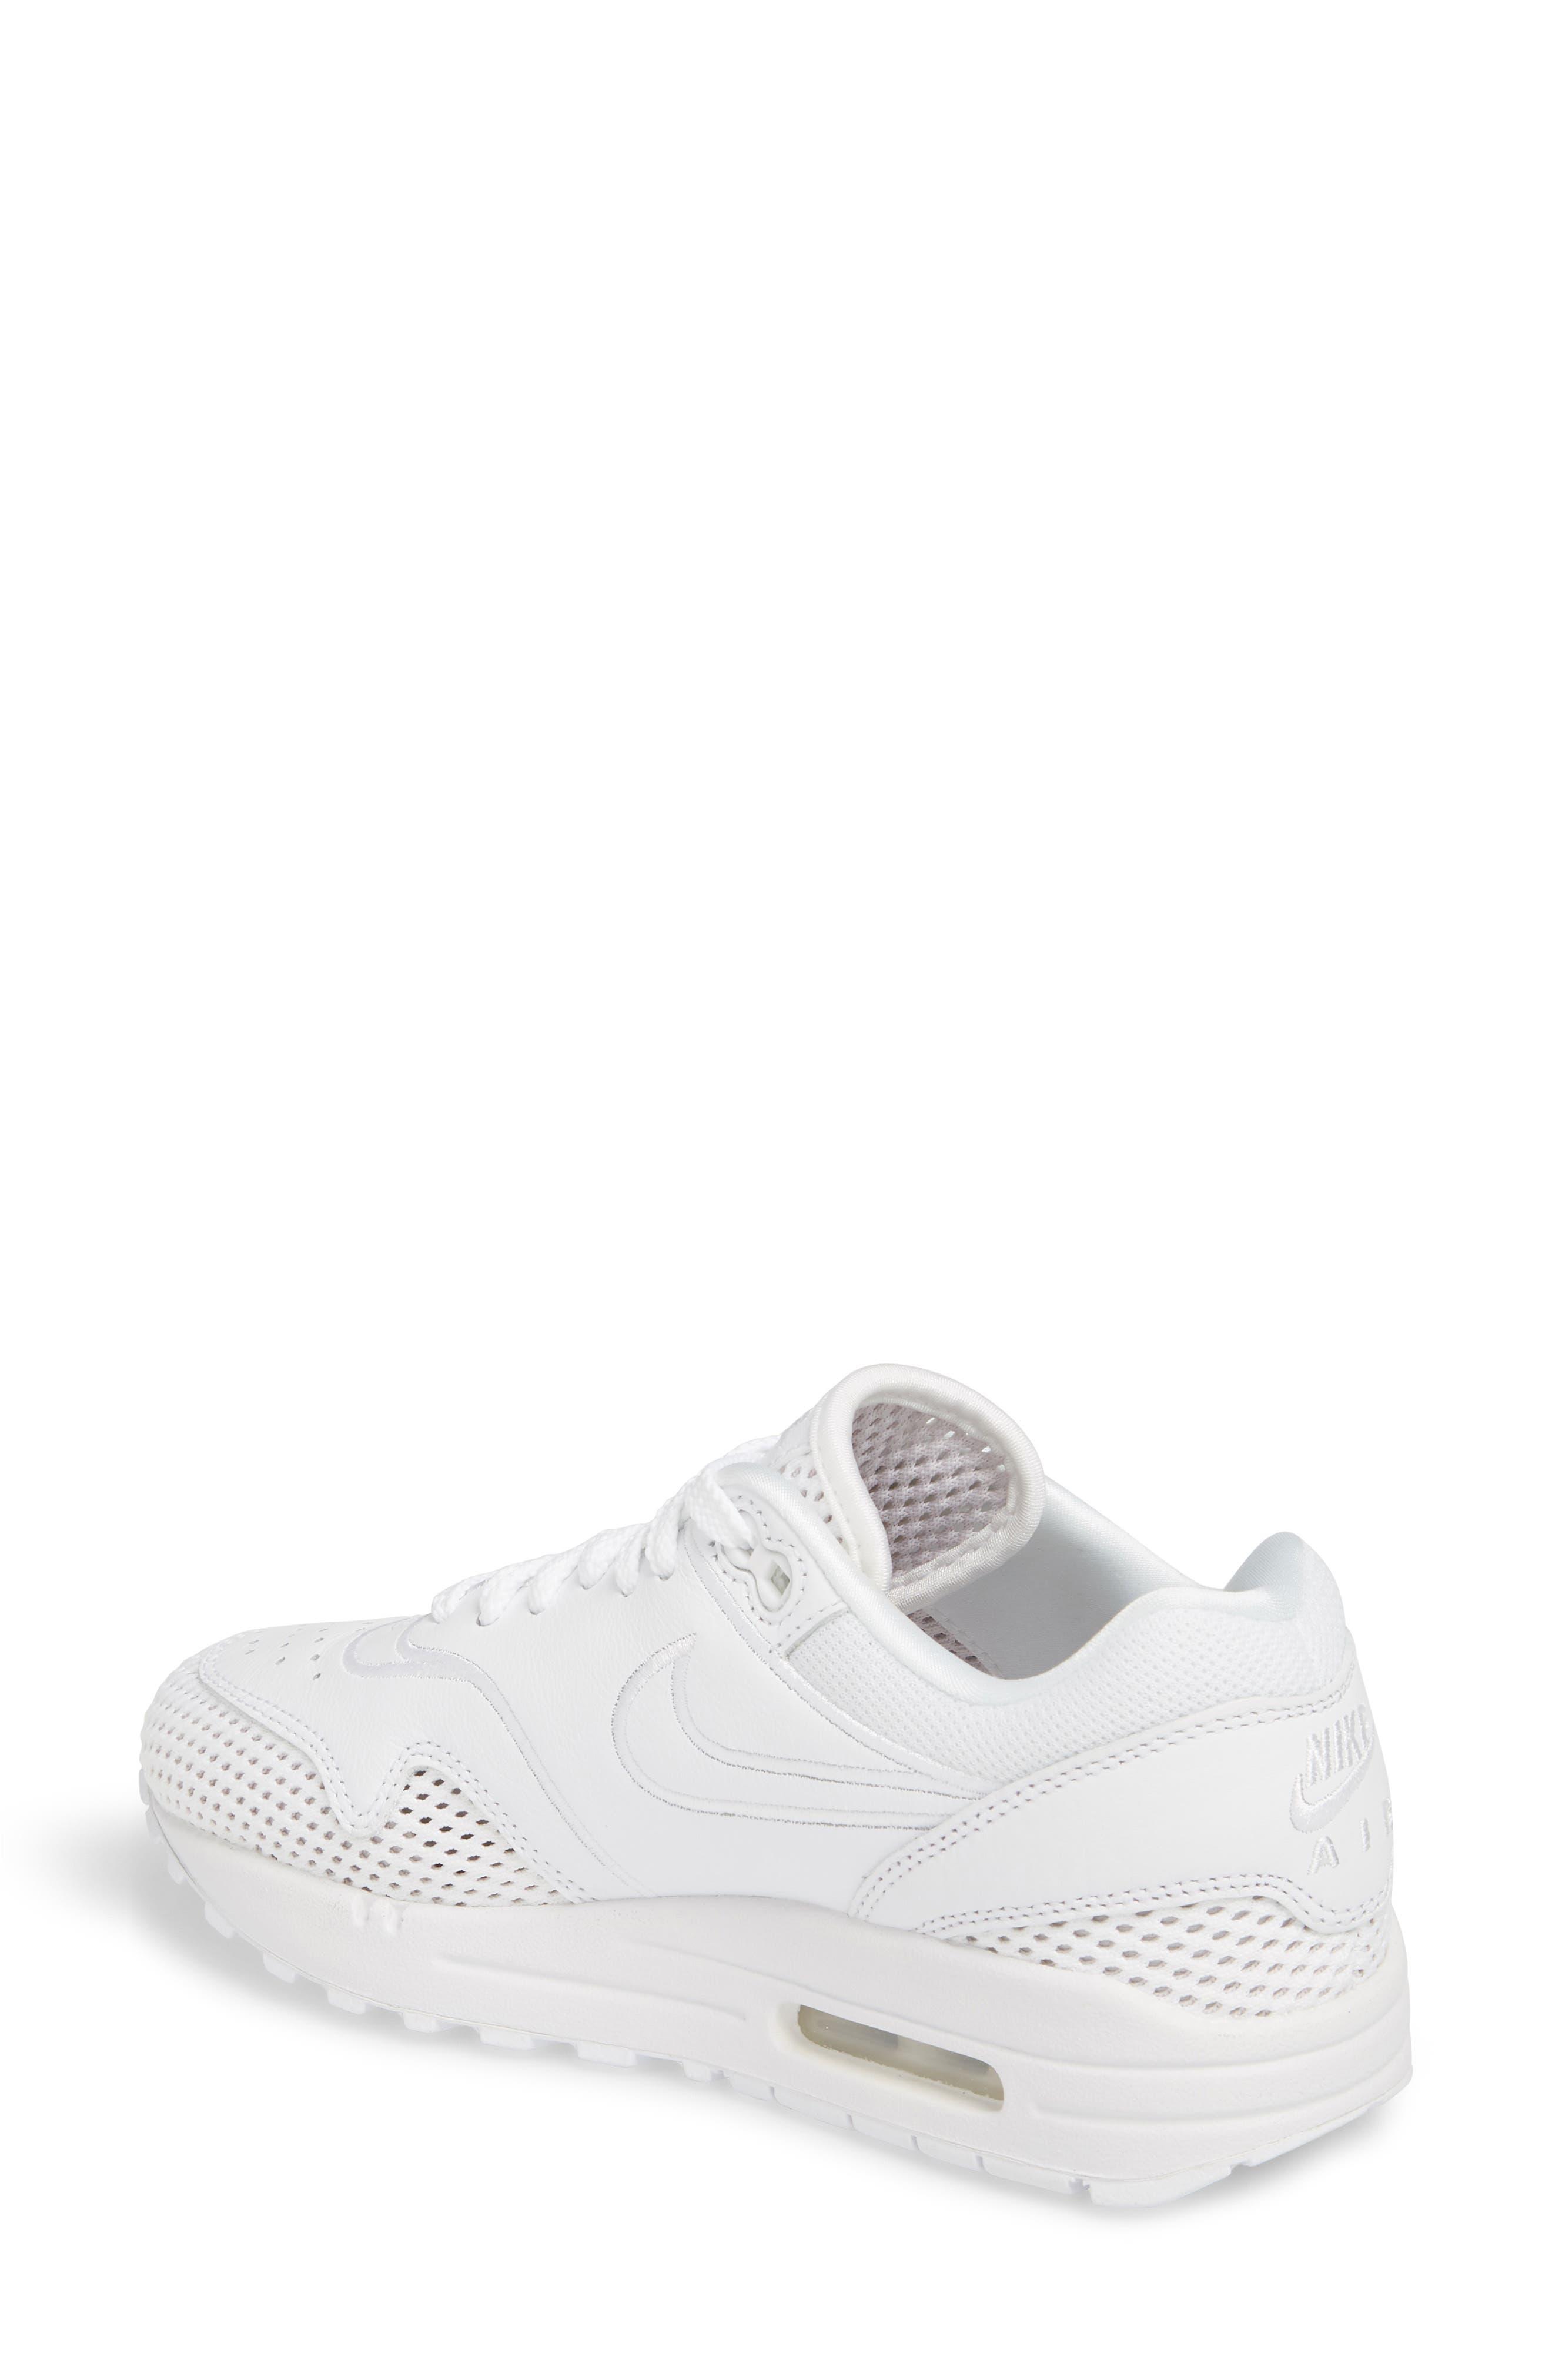 Air Max 1 SI Sneaker,                             Alternate thumbnail 2, color,                             100